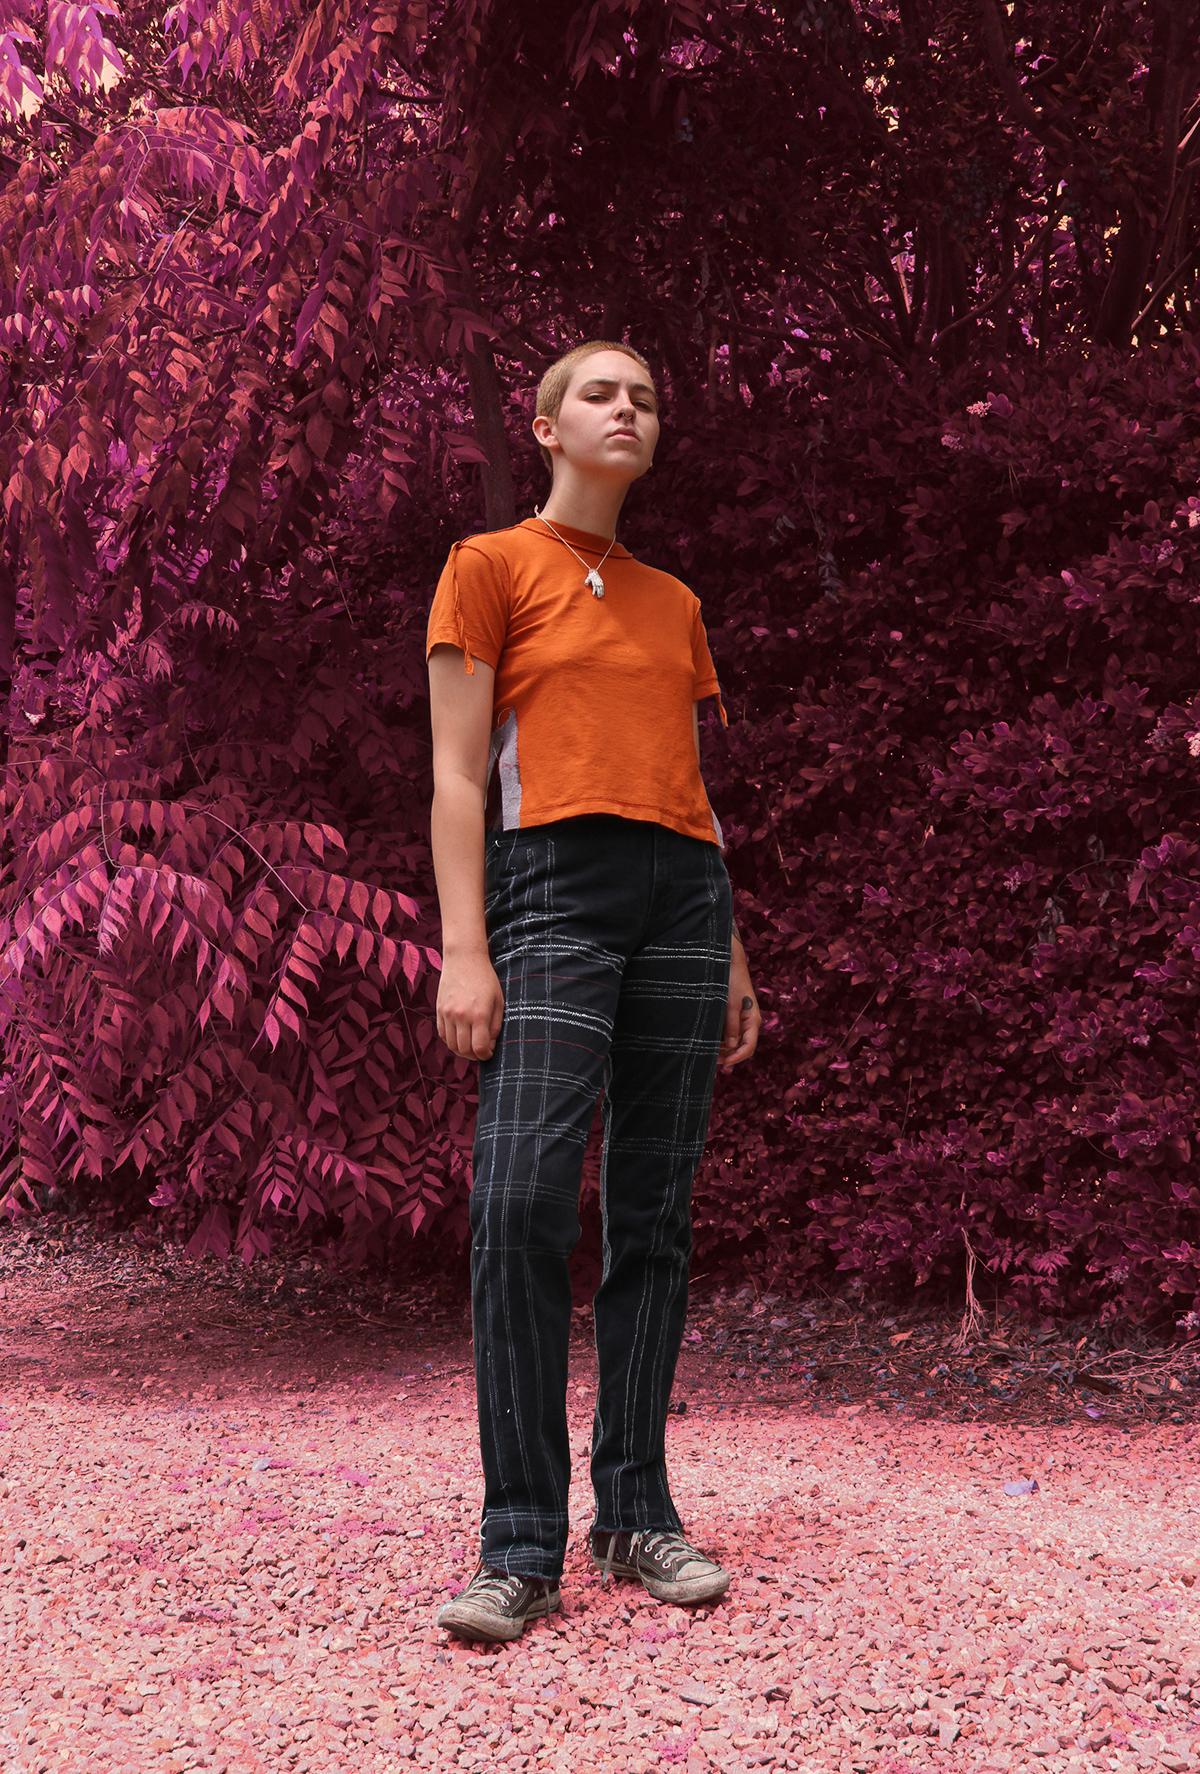 Nat_OrangeCrop_1_Pink_Fade_Web.jpg